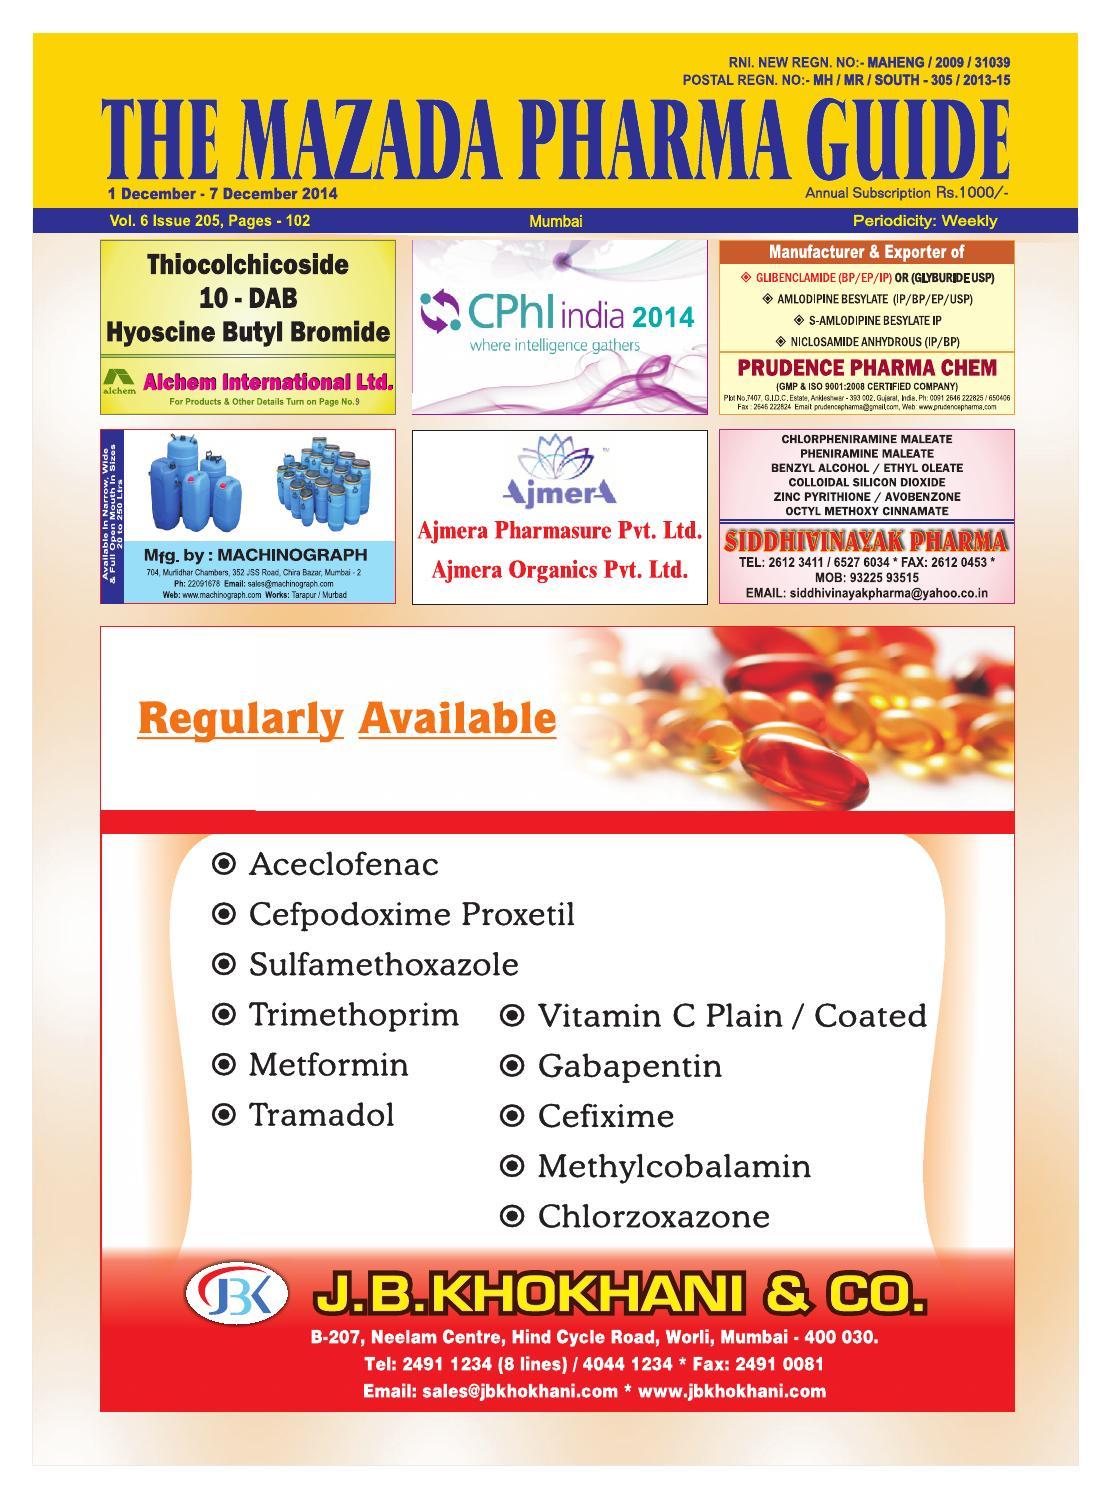 Levofloxacin hemihydrate usp 35 monograph.doc - The Mazda Pharma Guide 1 Dec 7 Dec 2014 By The Mazada Pharma Guide Issuu